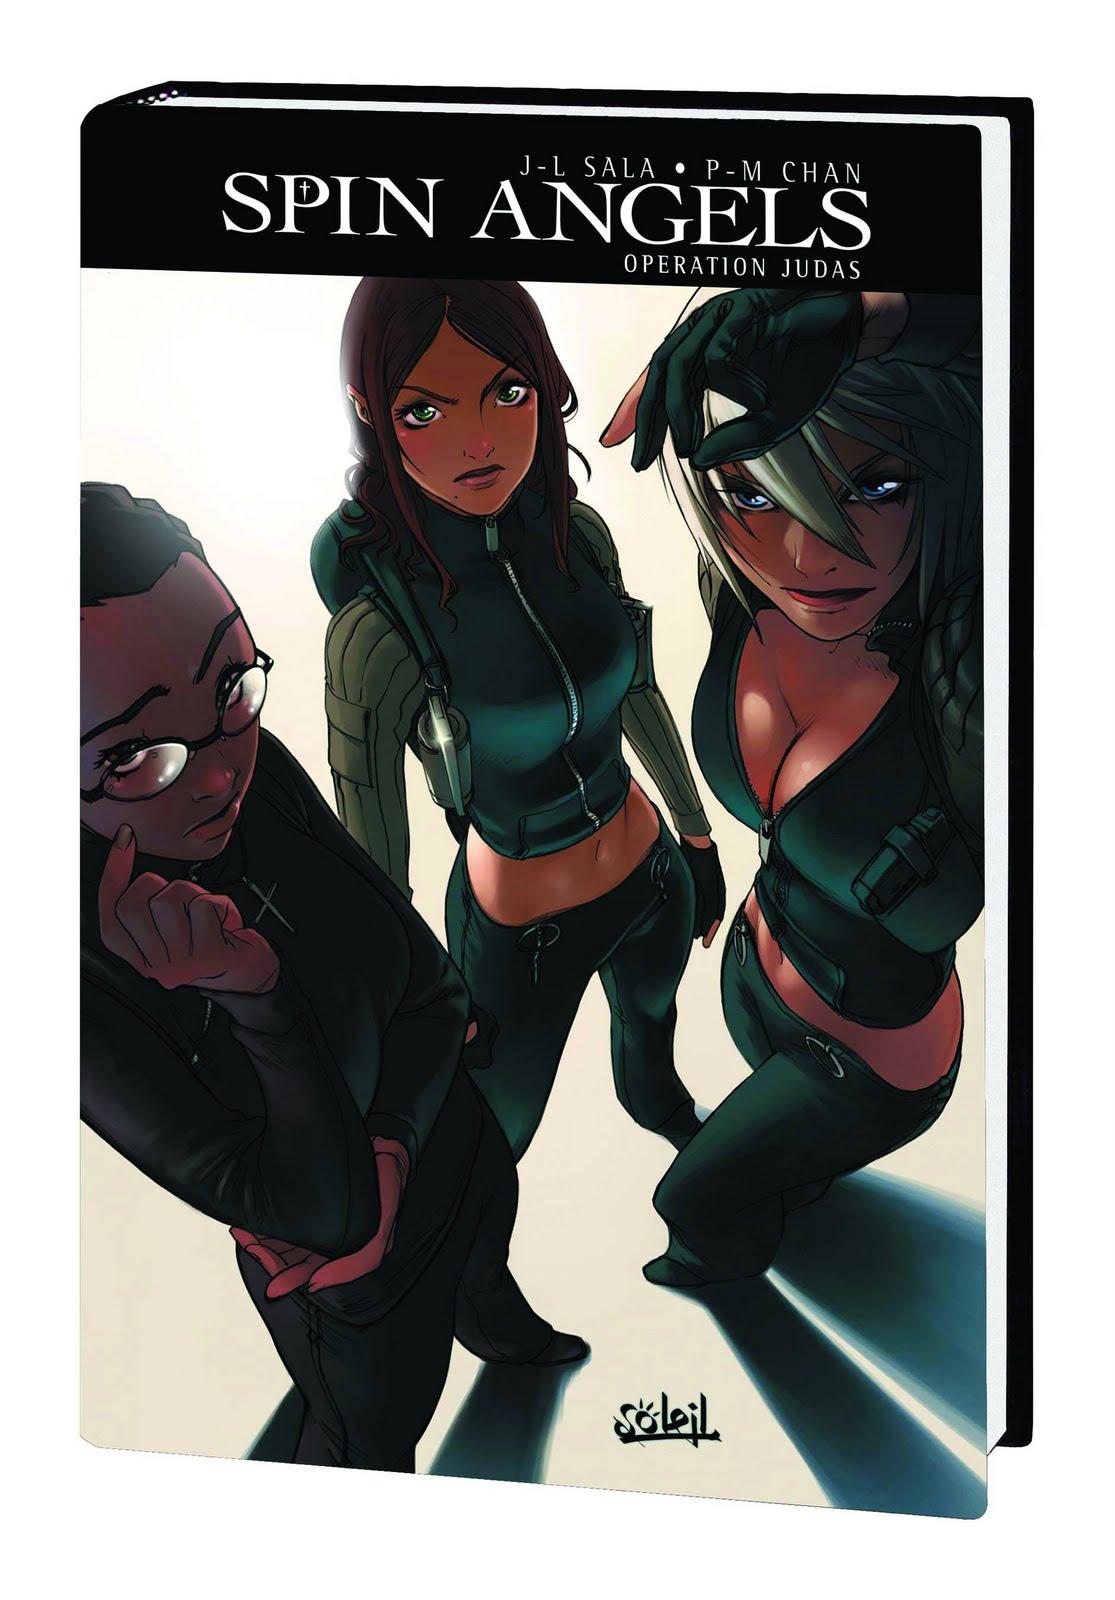 LABYRINTH BOOKS Toronto Comics MANGA and GRAPHIC NOVELS ...